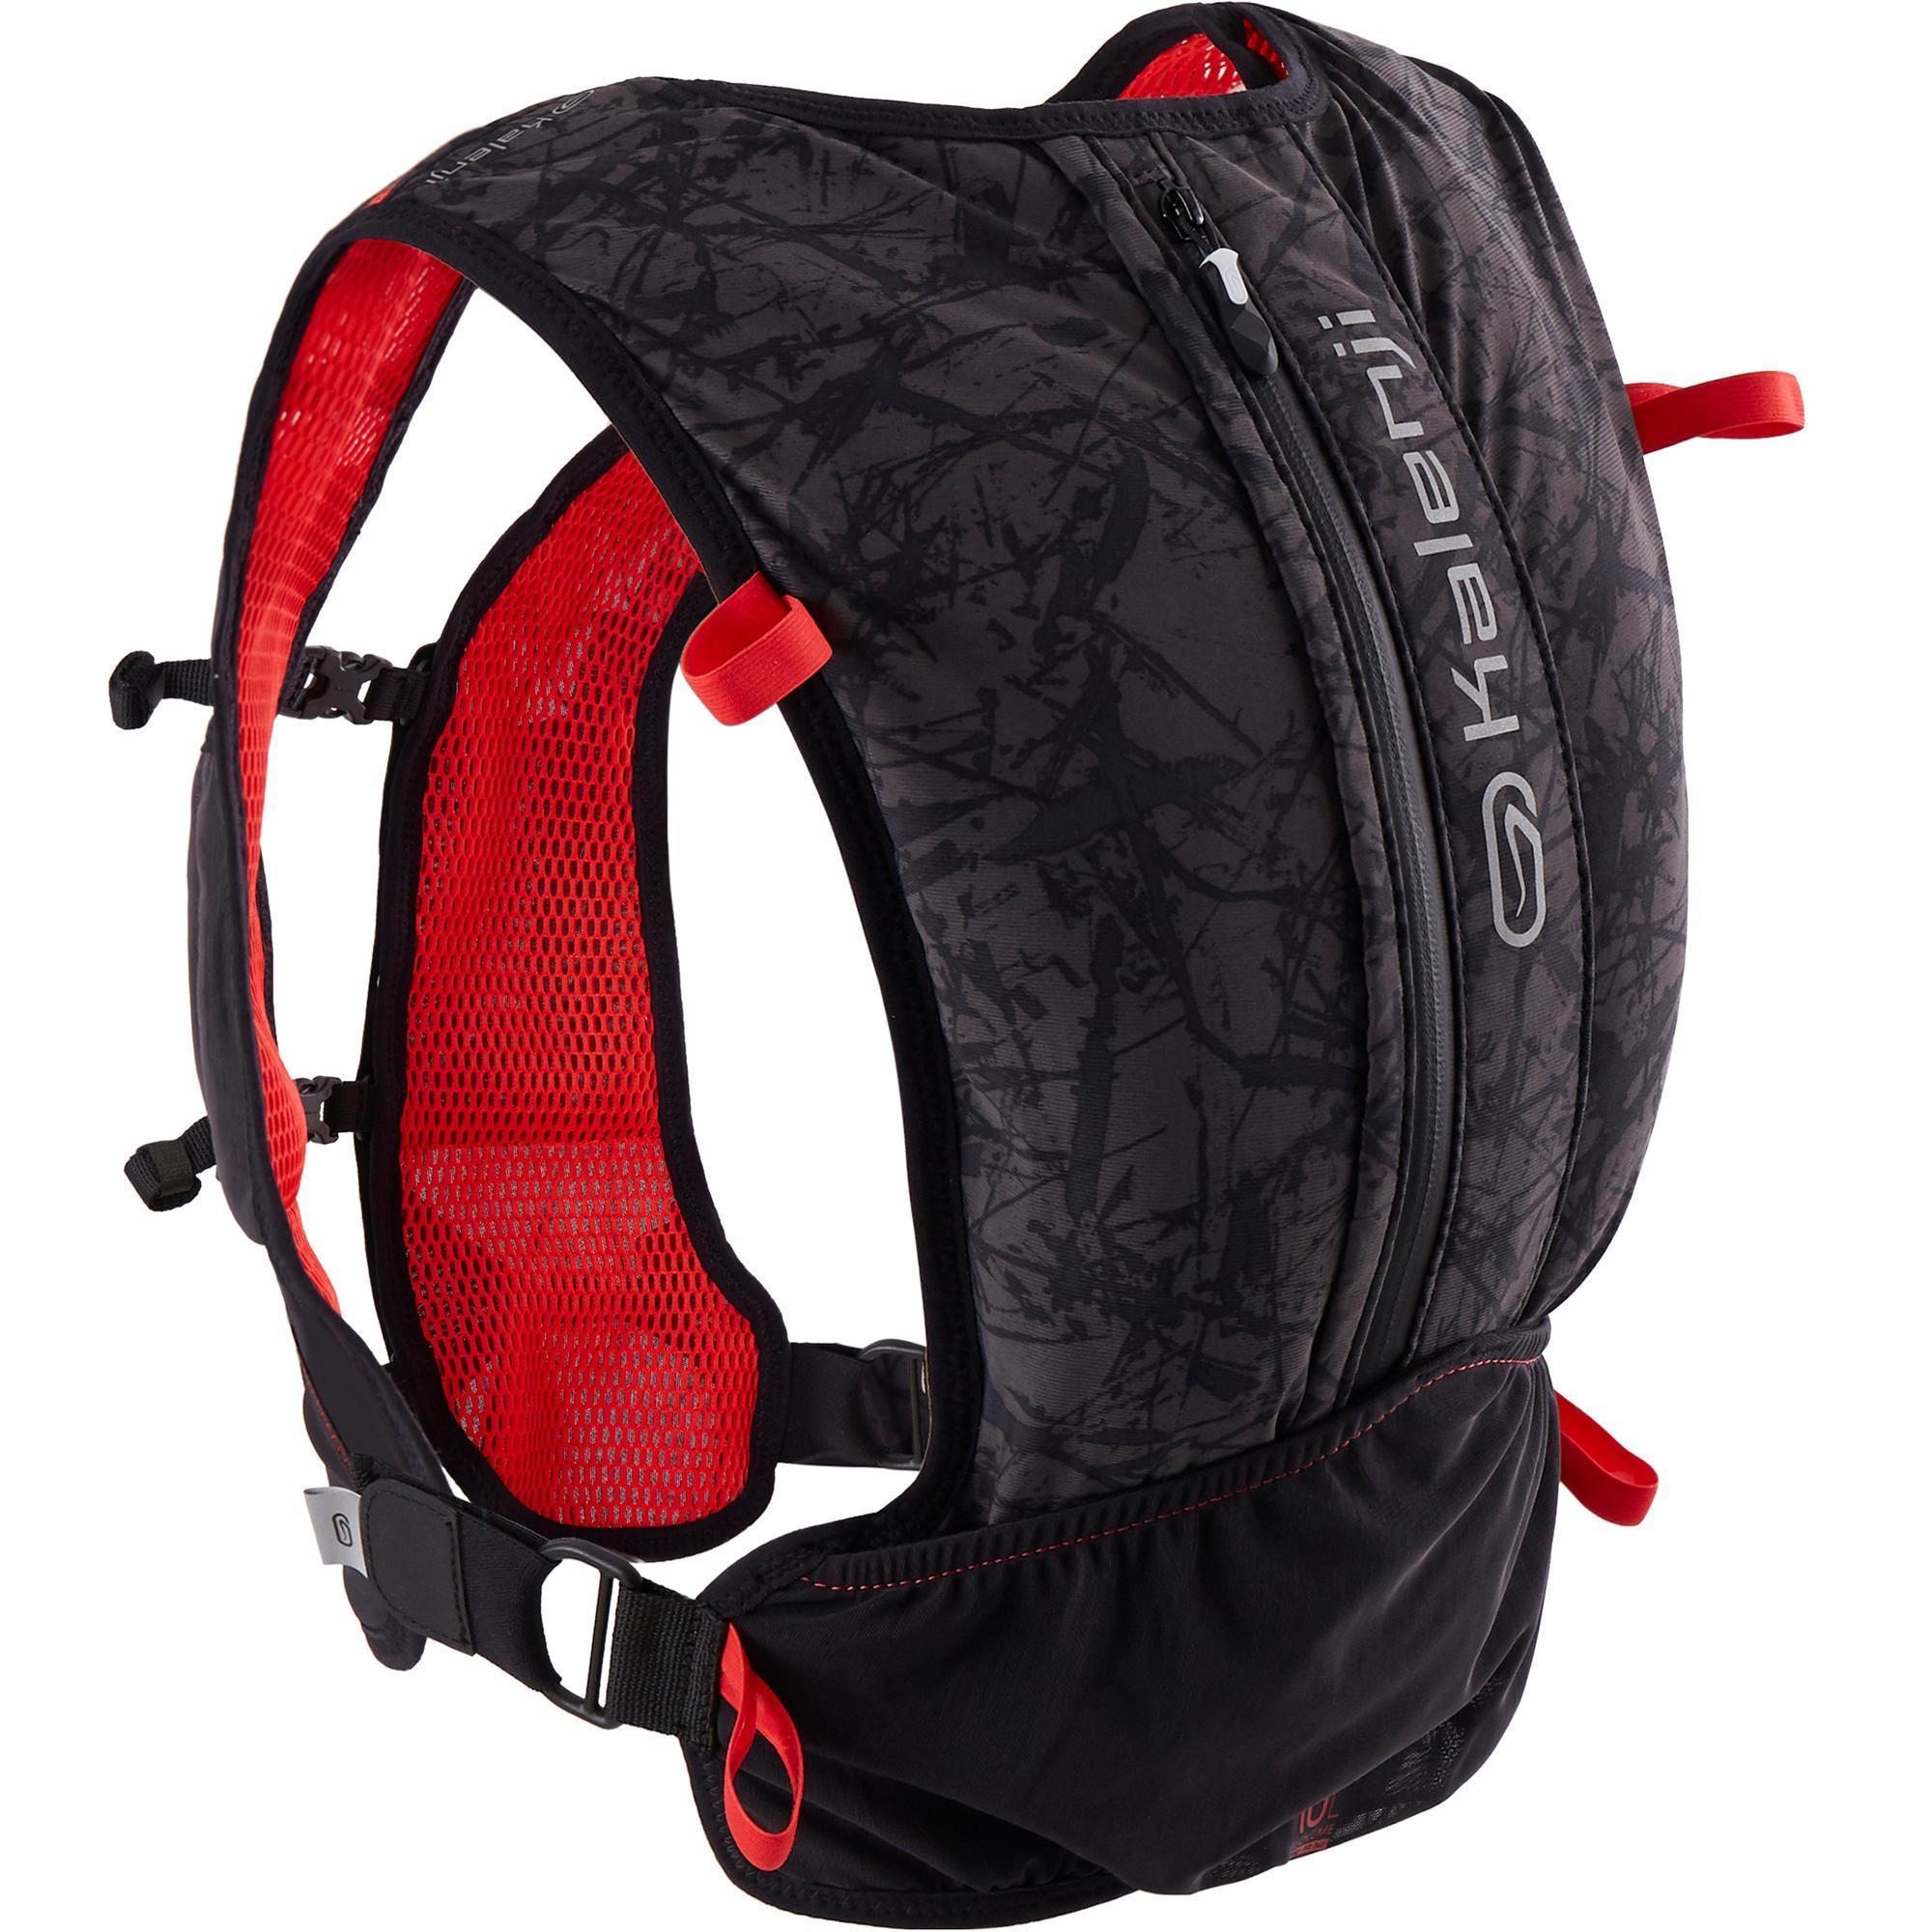 Sac de running / trail Kalenji - 10 L, noir / rouge